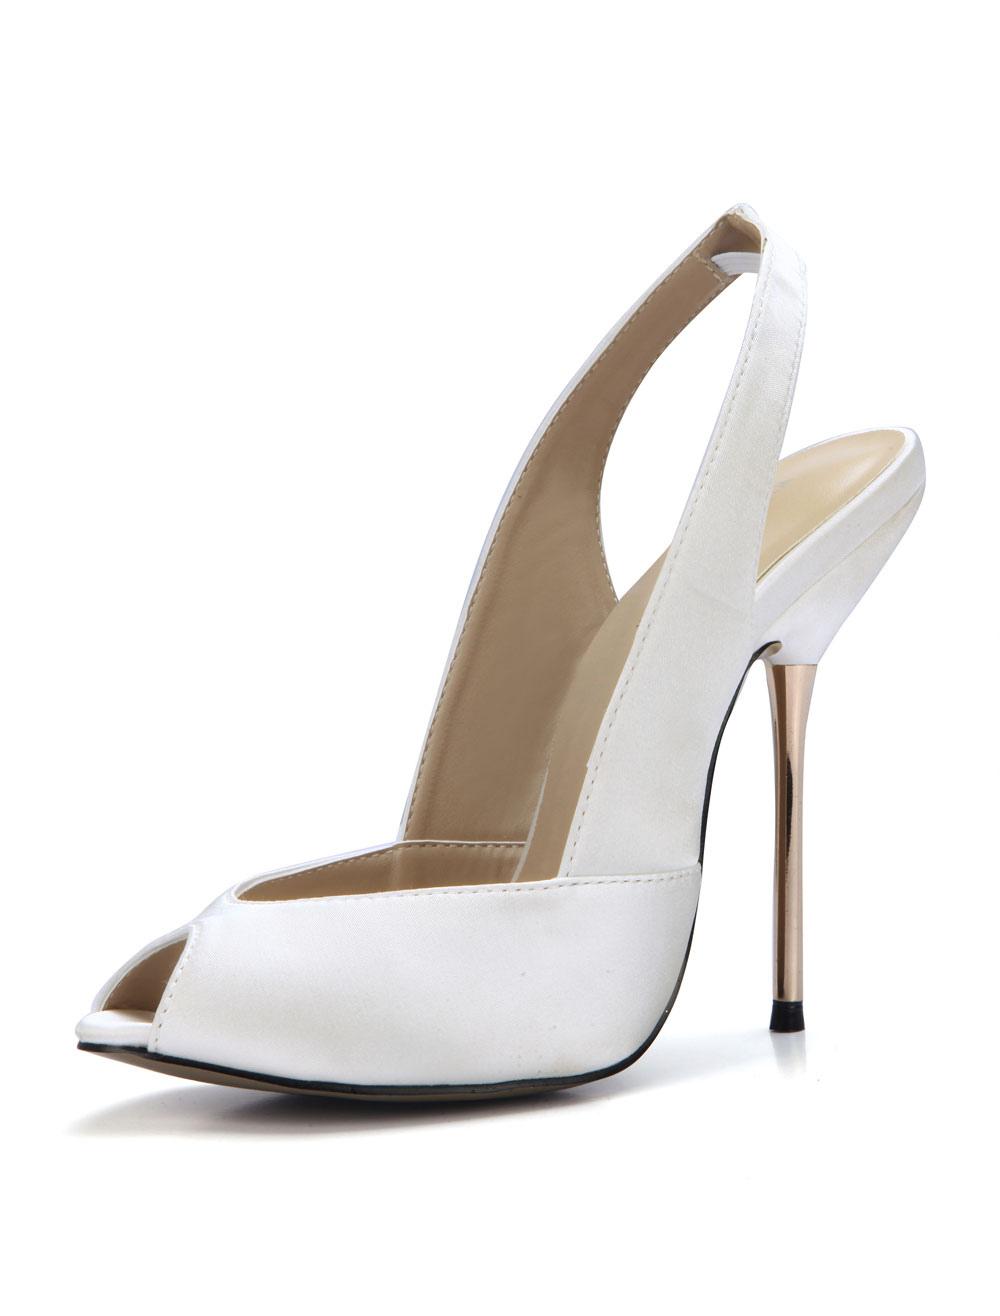 Buy Ivory Evening Shoes Satin Peep Toe Slingbacks High Heels Women Wedding Shoes for $59.49 in Milanoo store